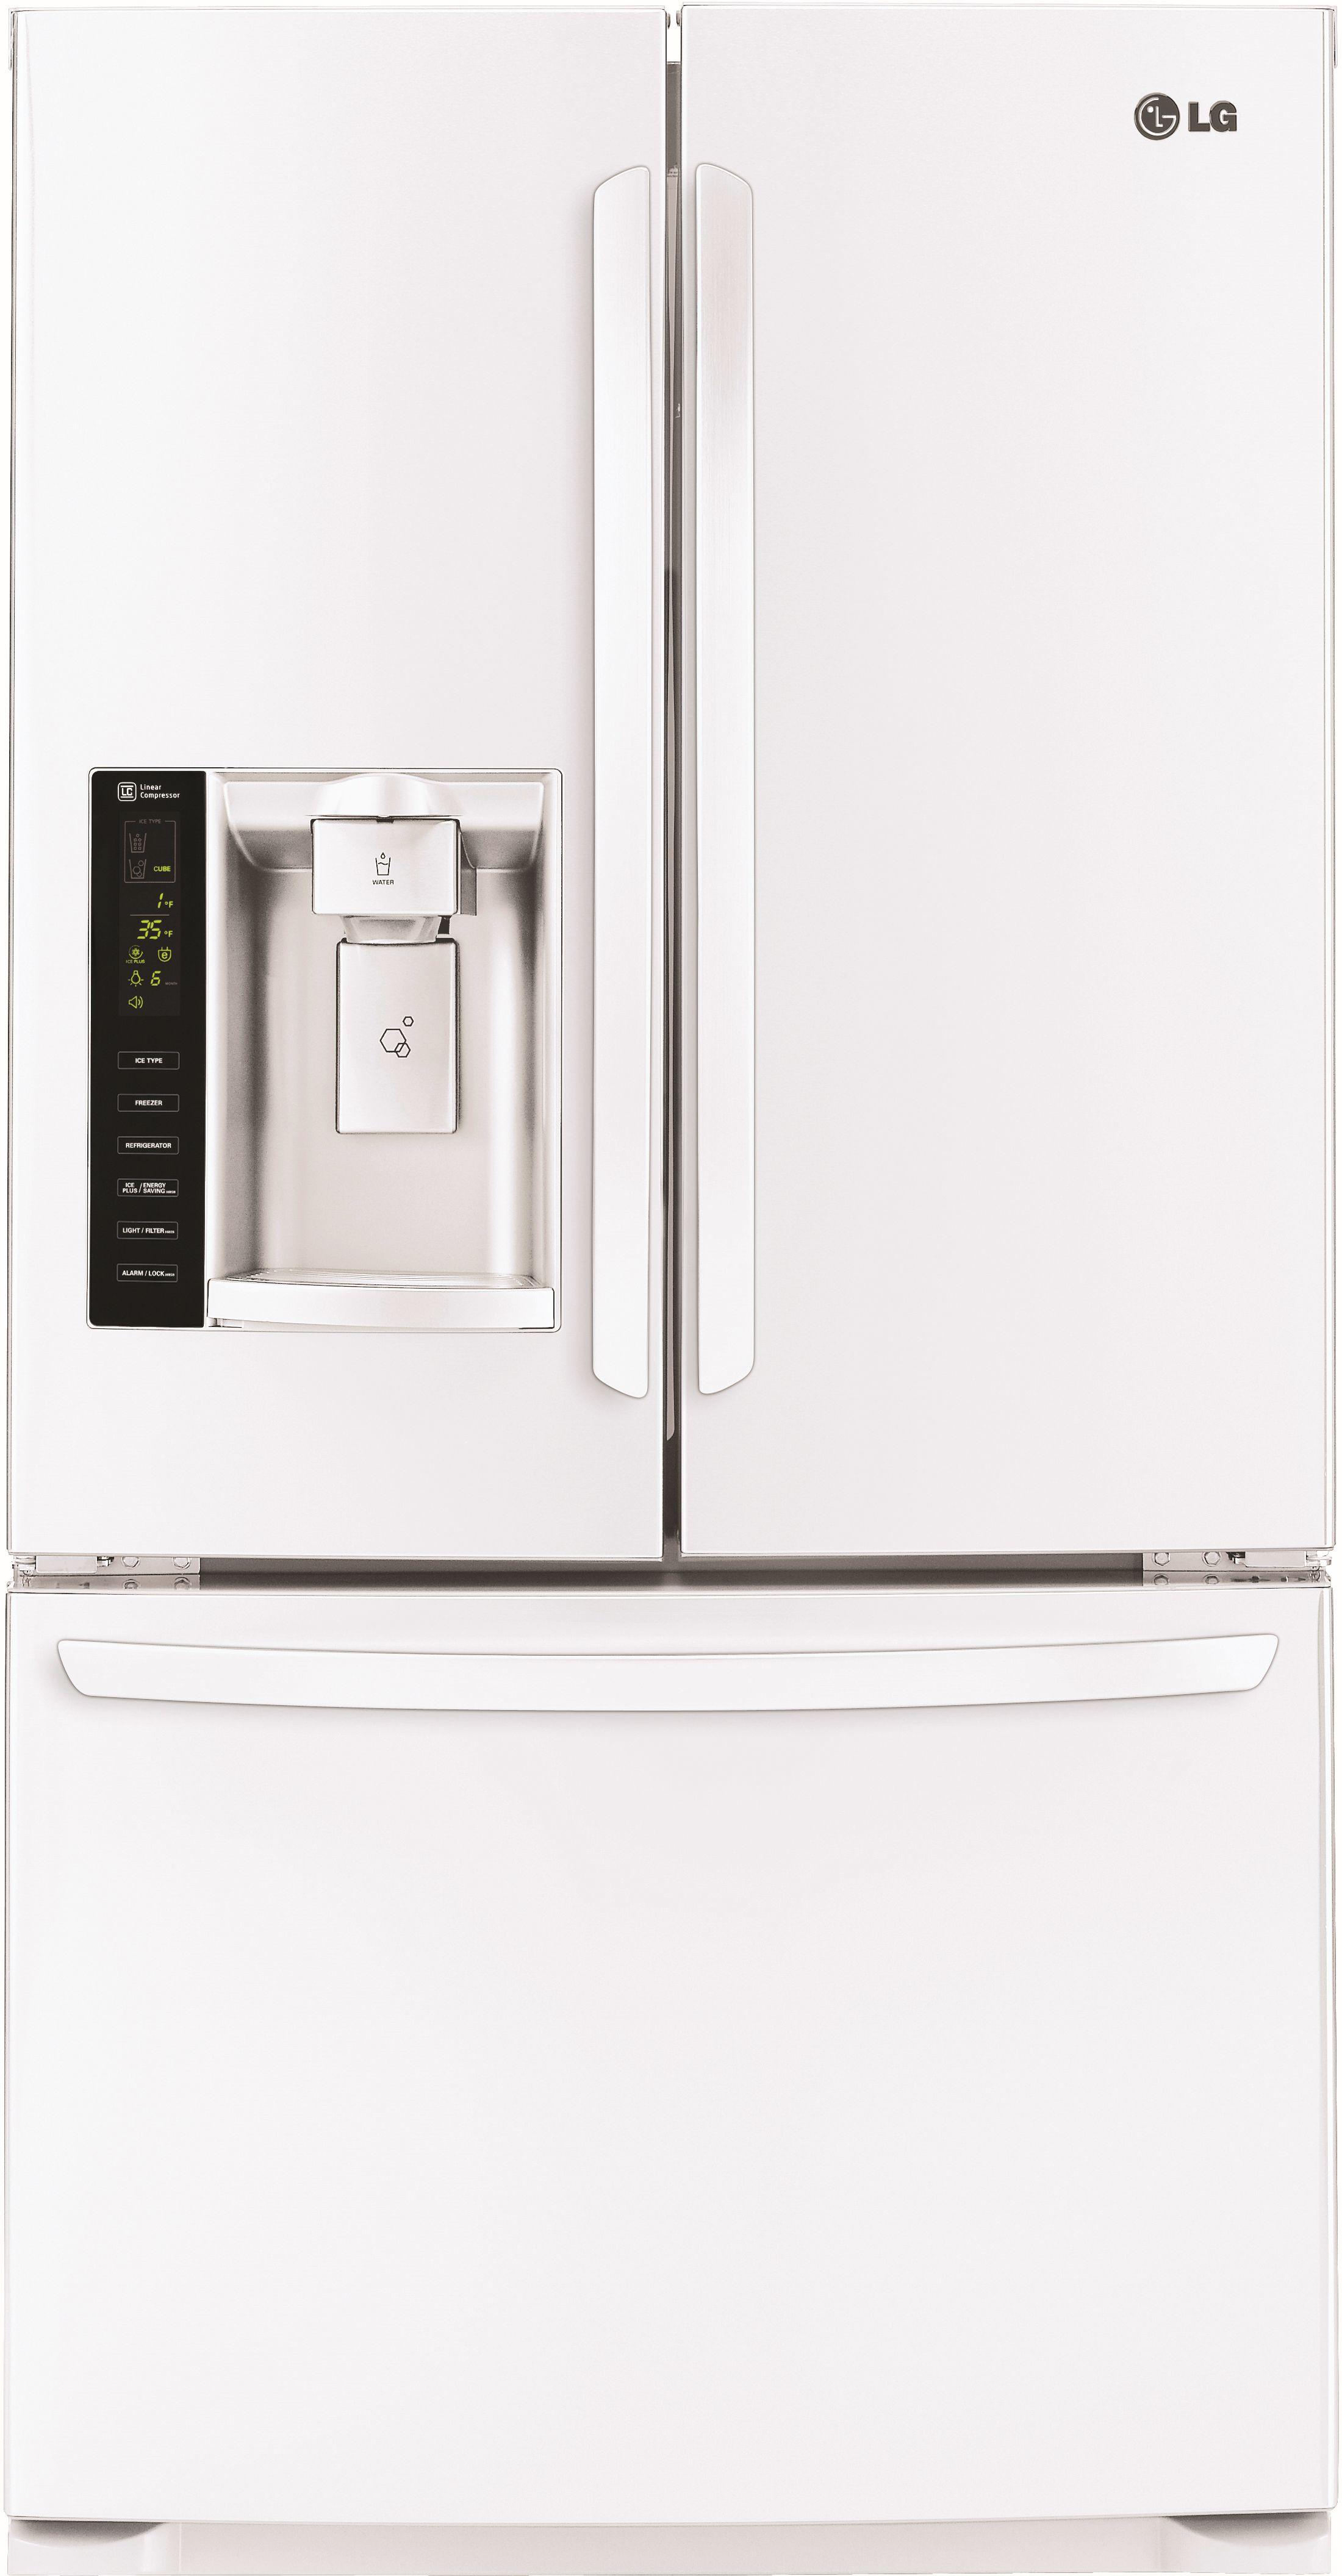 25 cu ft french door refrigerator smooth white lfx25974sw lg 25 cu ft french door refrigerator smooth white lfx25974sw rubansaba